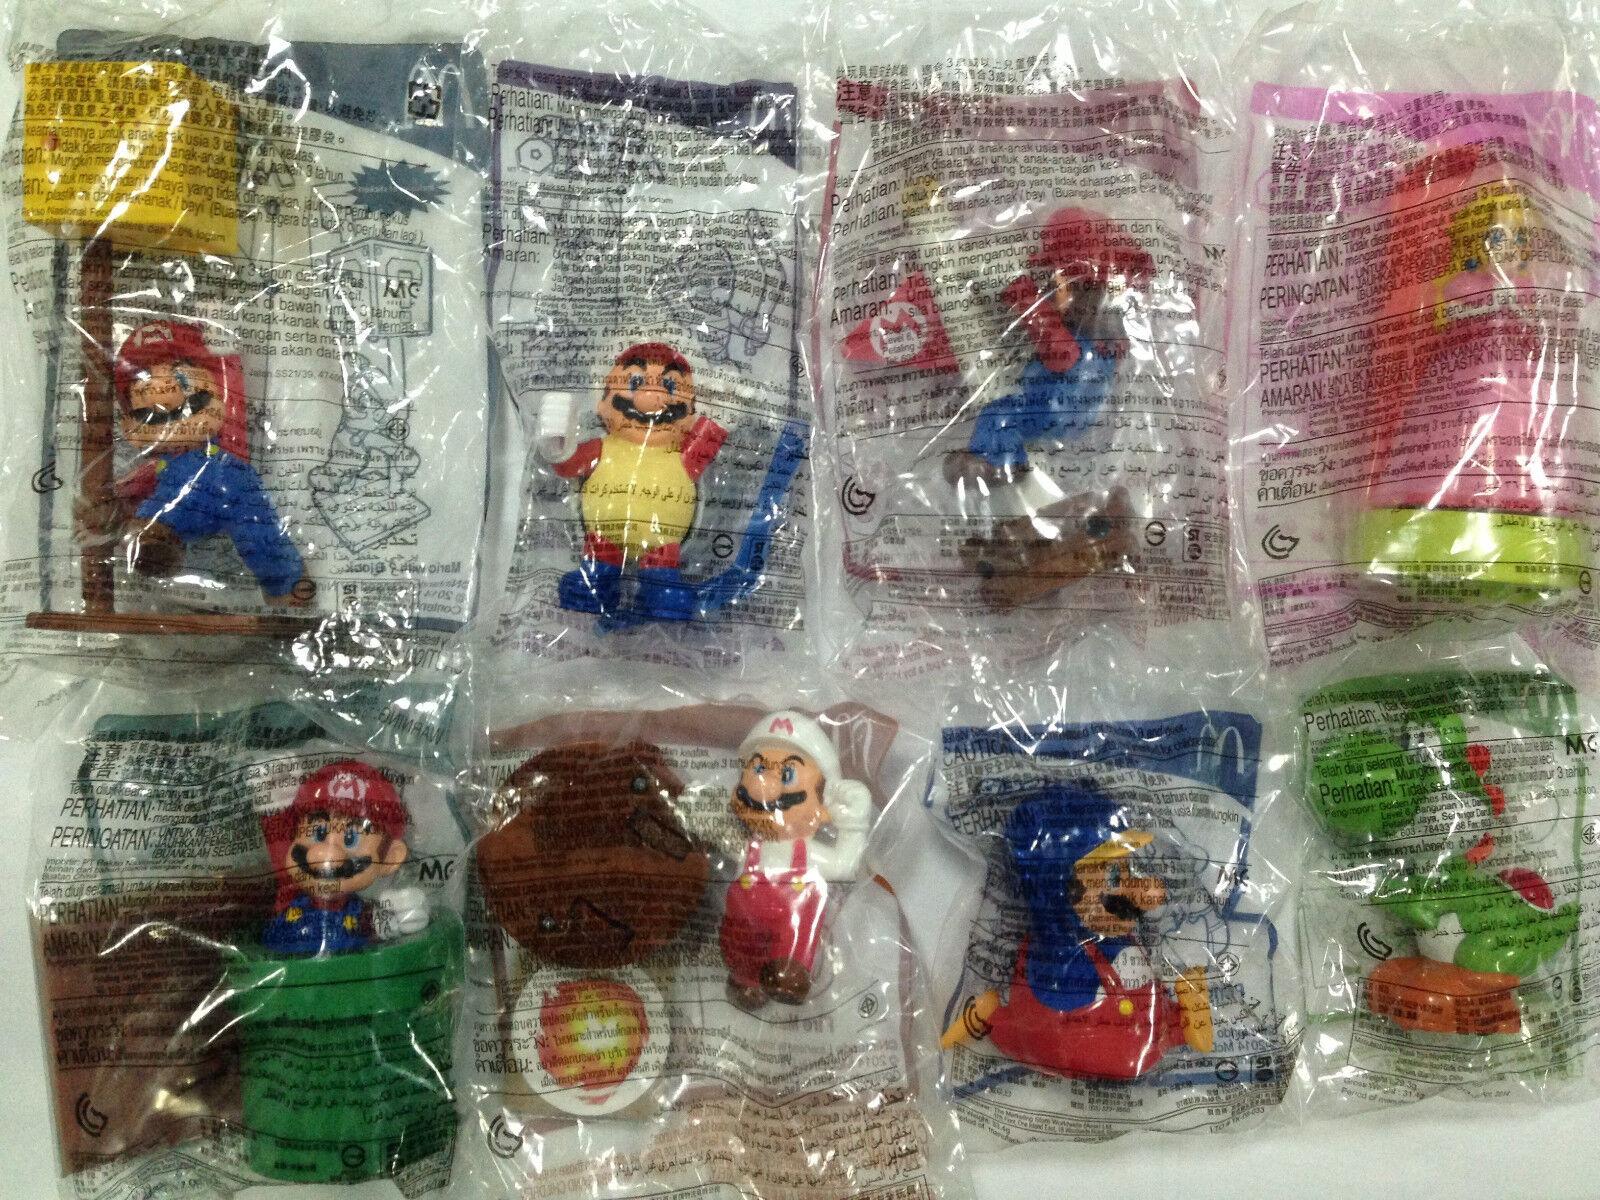 McDonald's Happy Meal Toys SUPER MARIO 2014 ASIA (8 Pieces In Set)